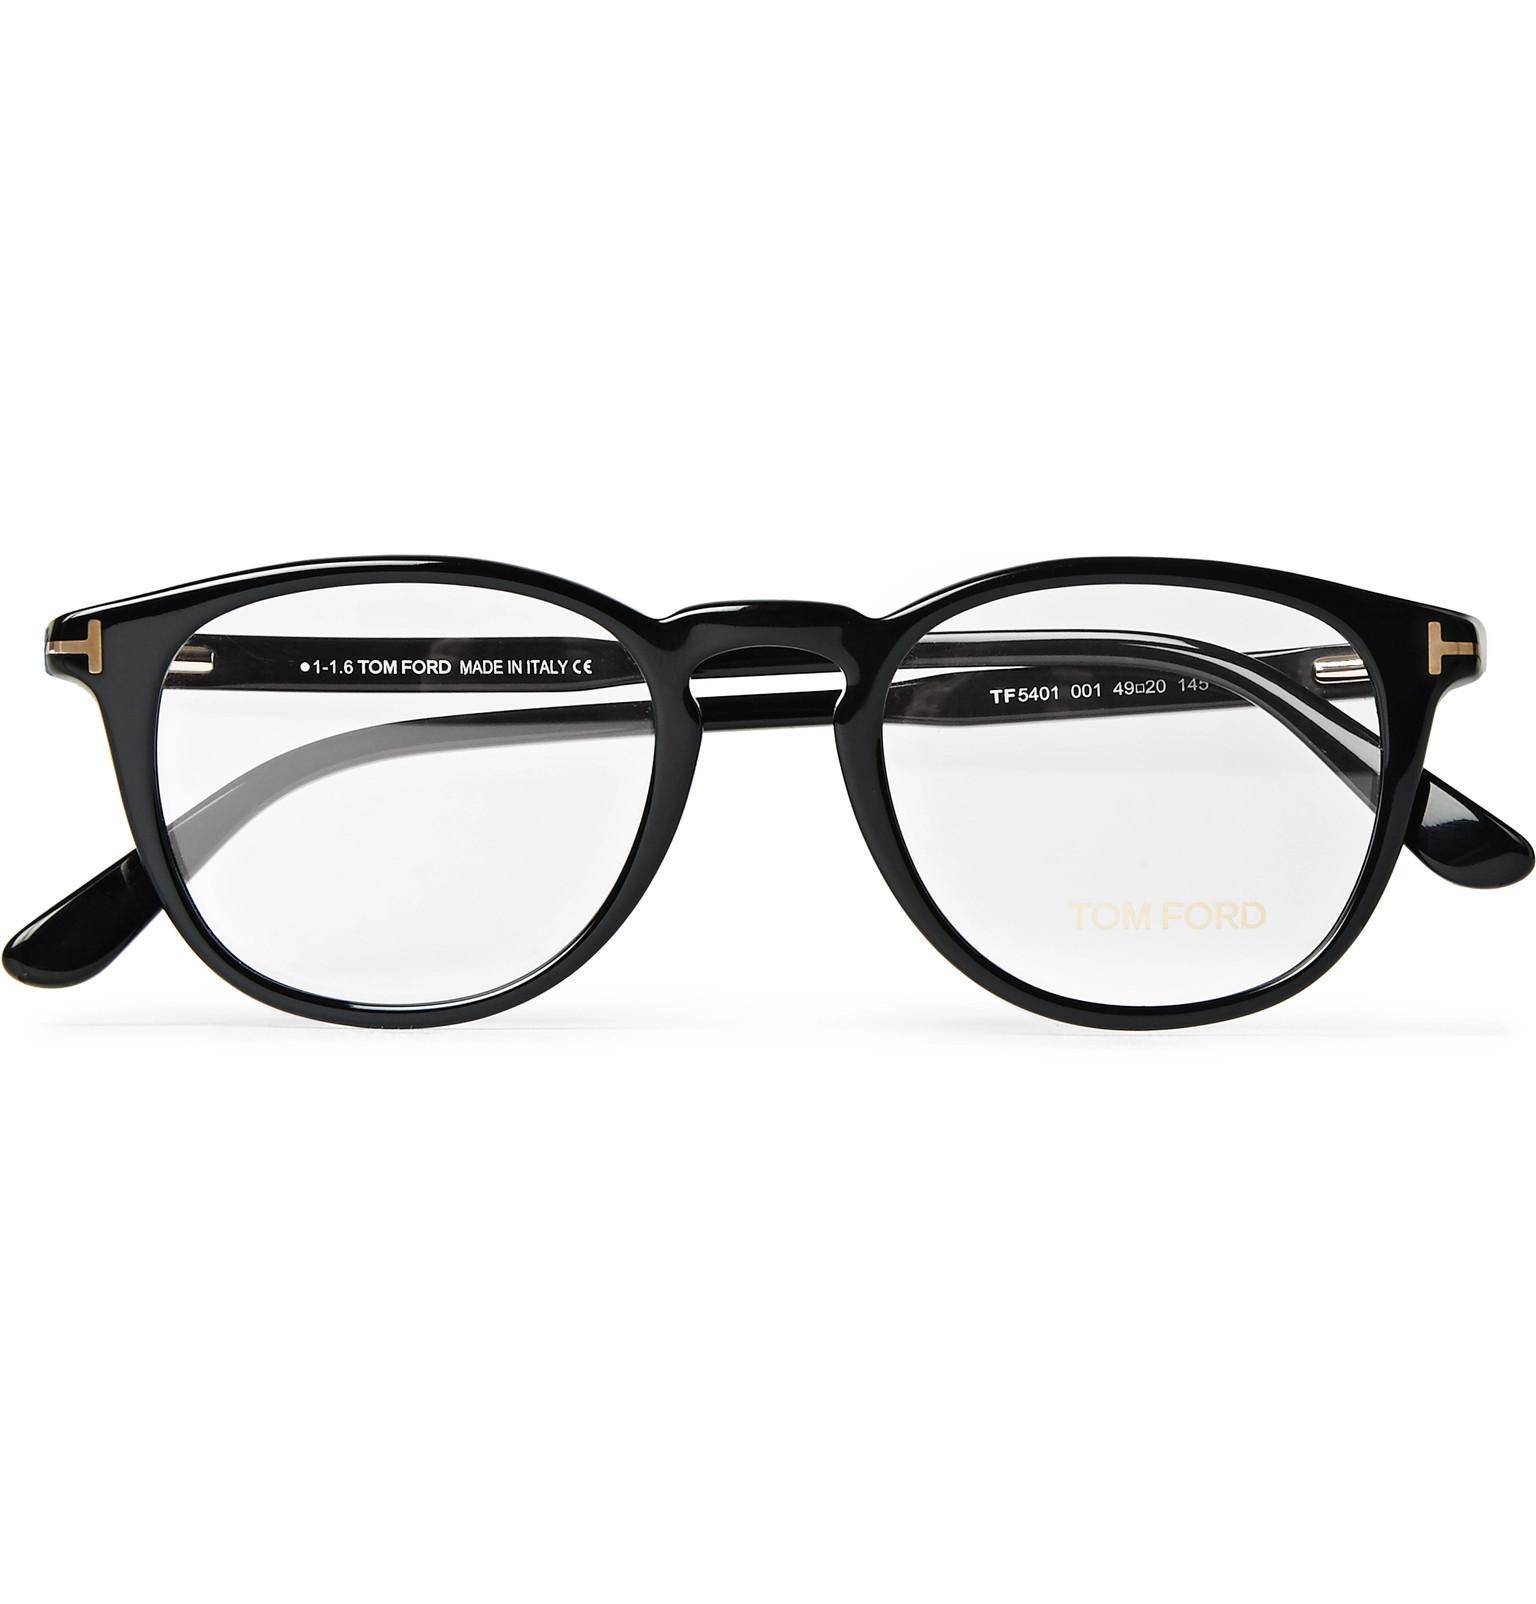 53de8cdbbc8 Tom Ford Round-frame Acetate Optical Glasses in Black for Men - Save ...